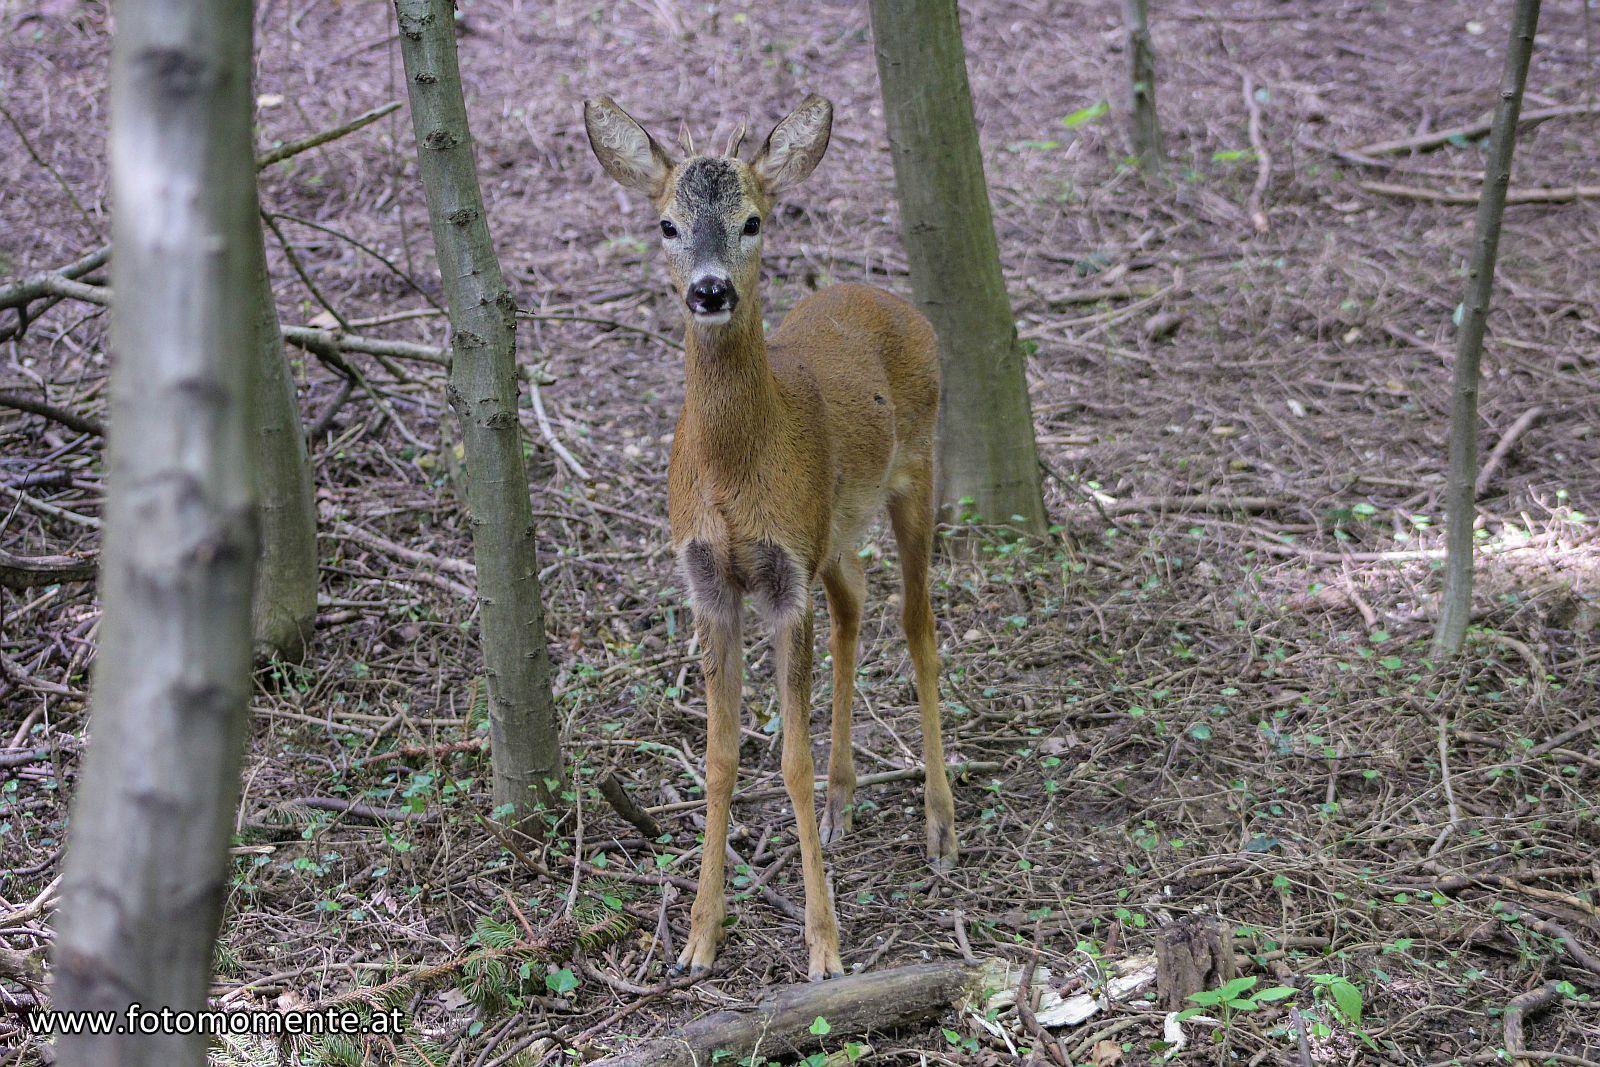 Rehbock - Junger Rehbock im Wald